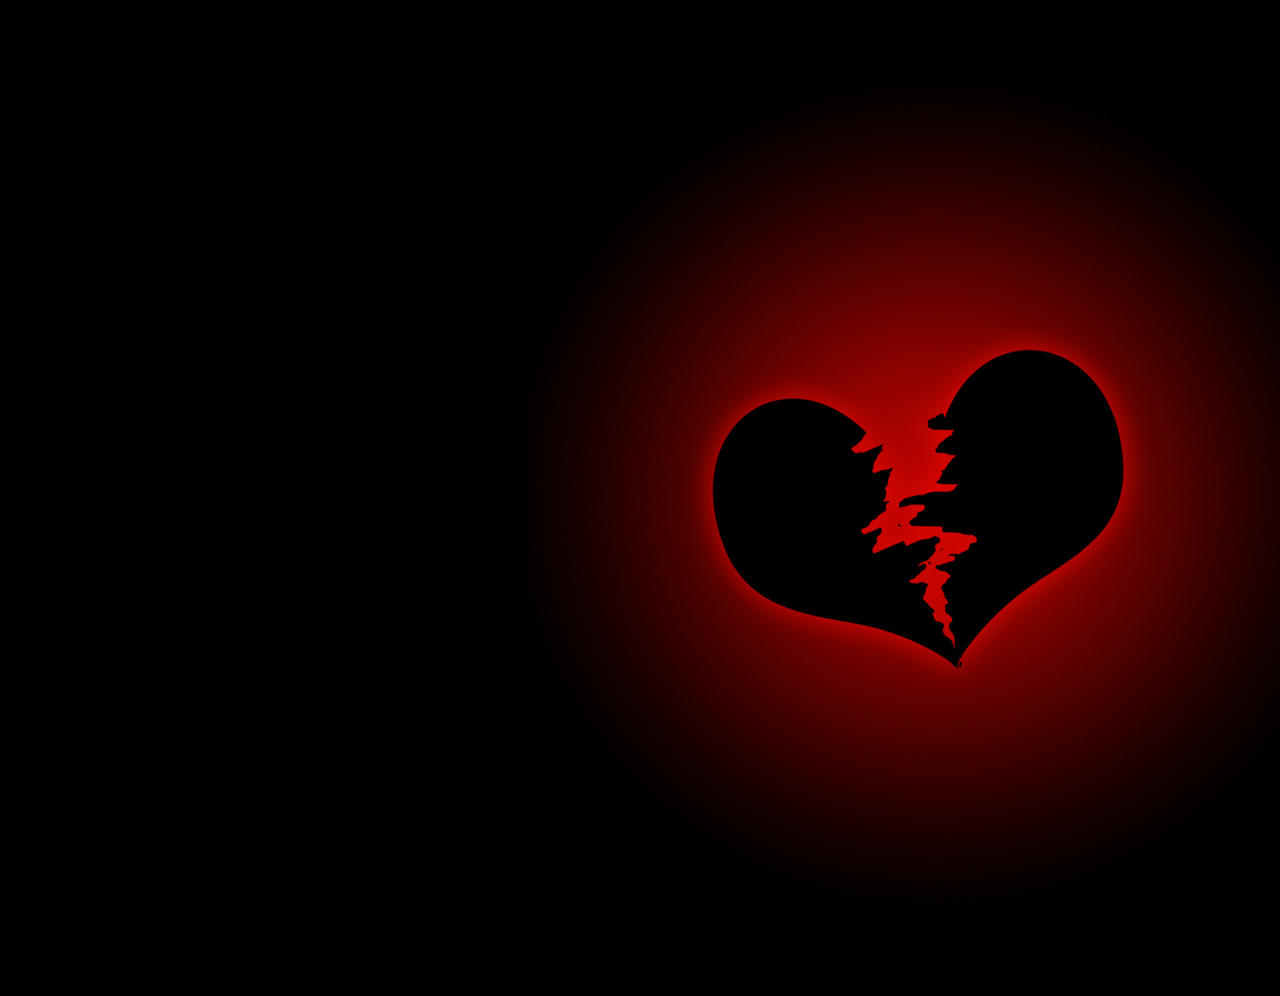 Broken Heart by admx on DeviantArt